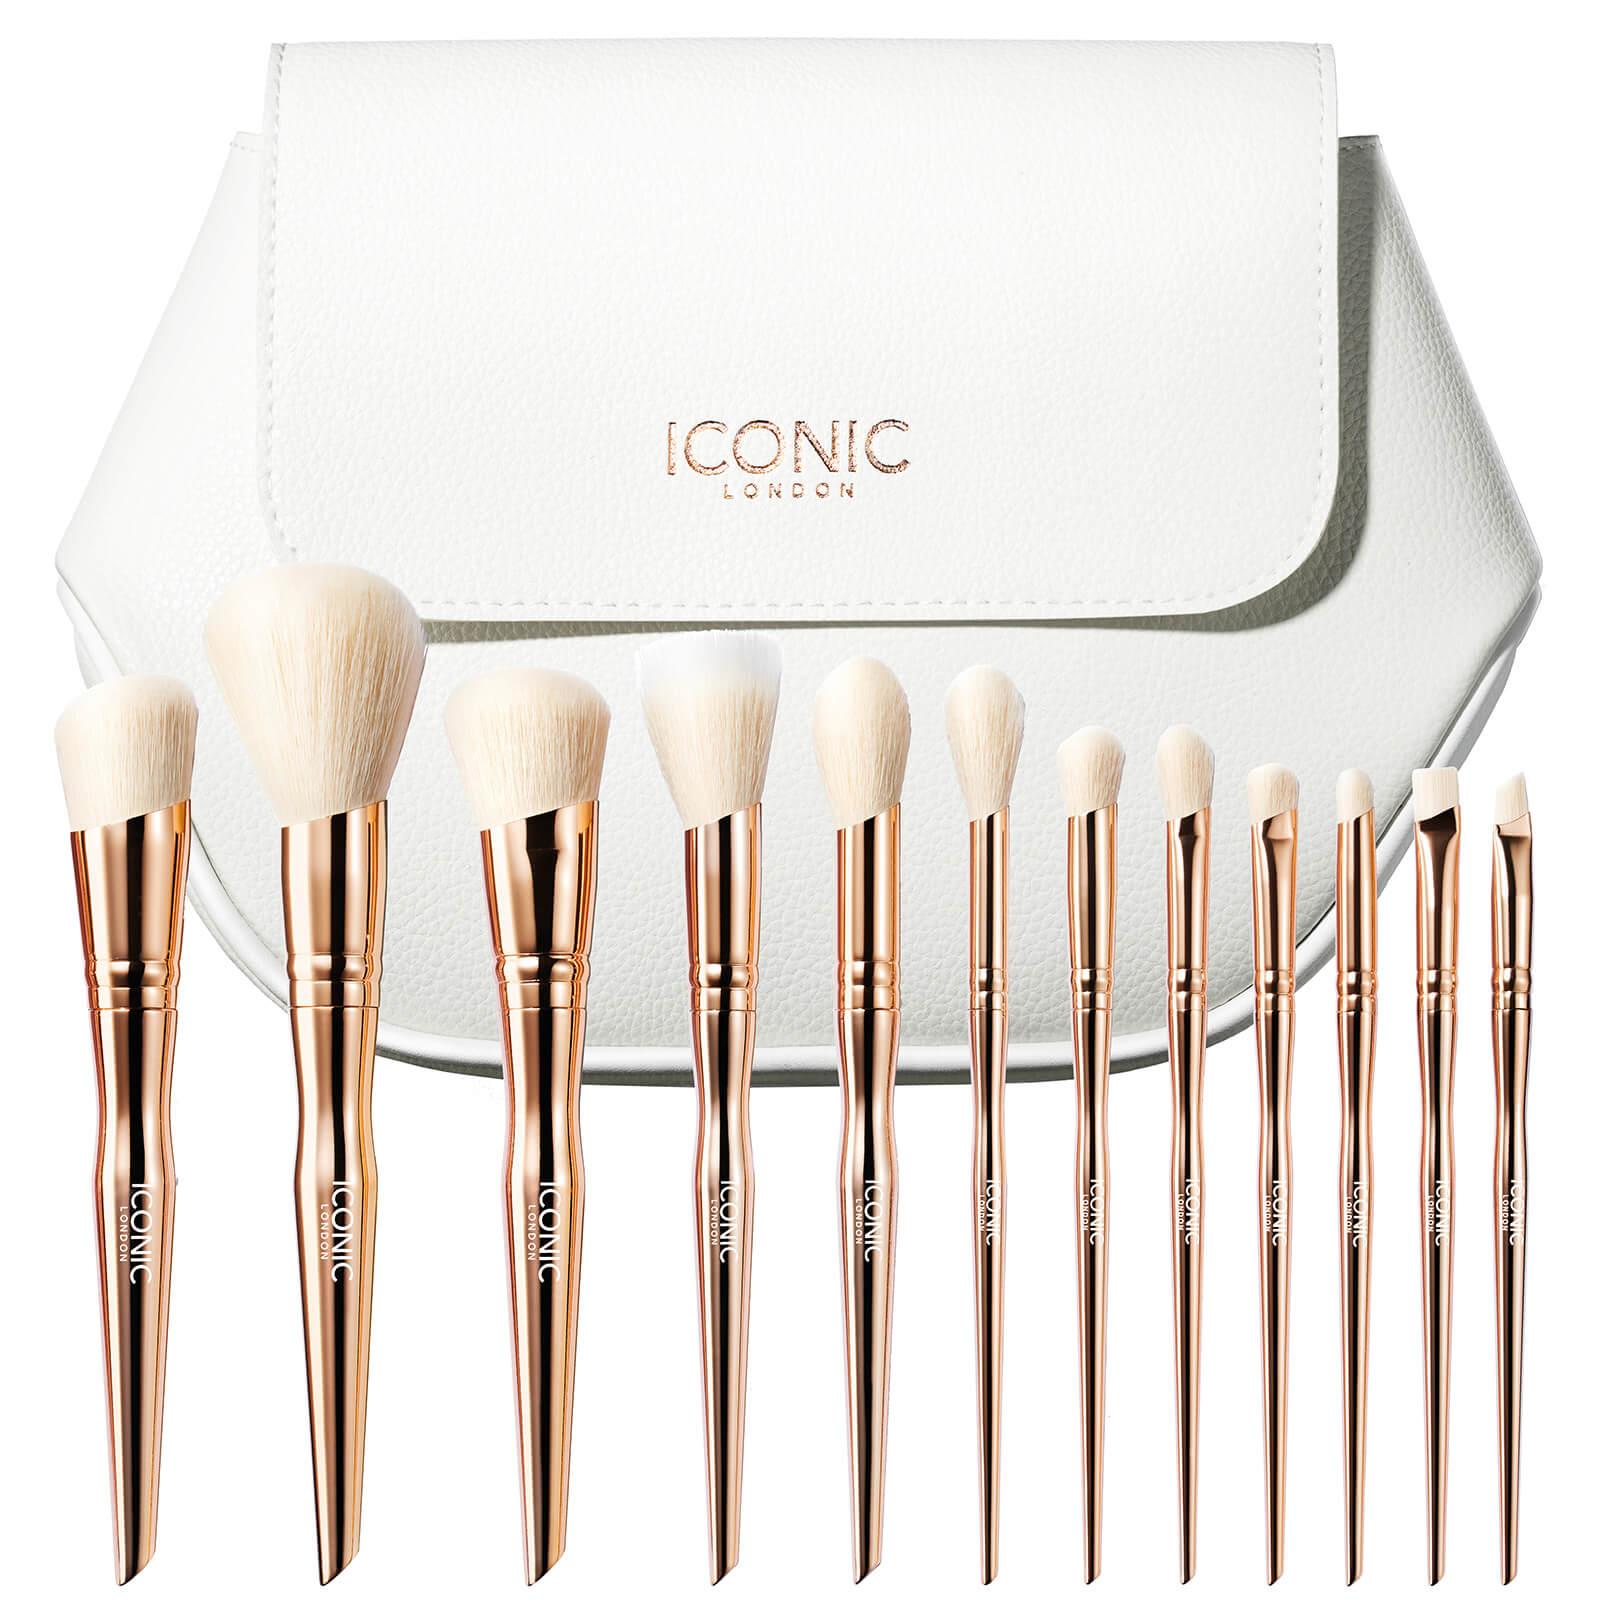 Купить ICONIC London All Angles Brush Set